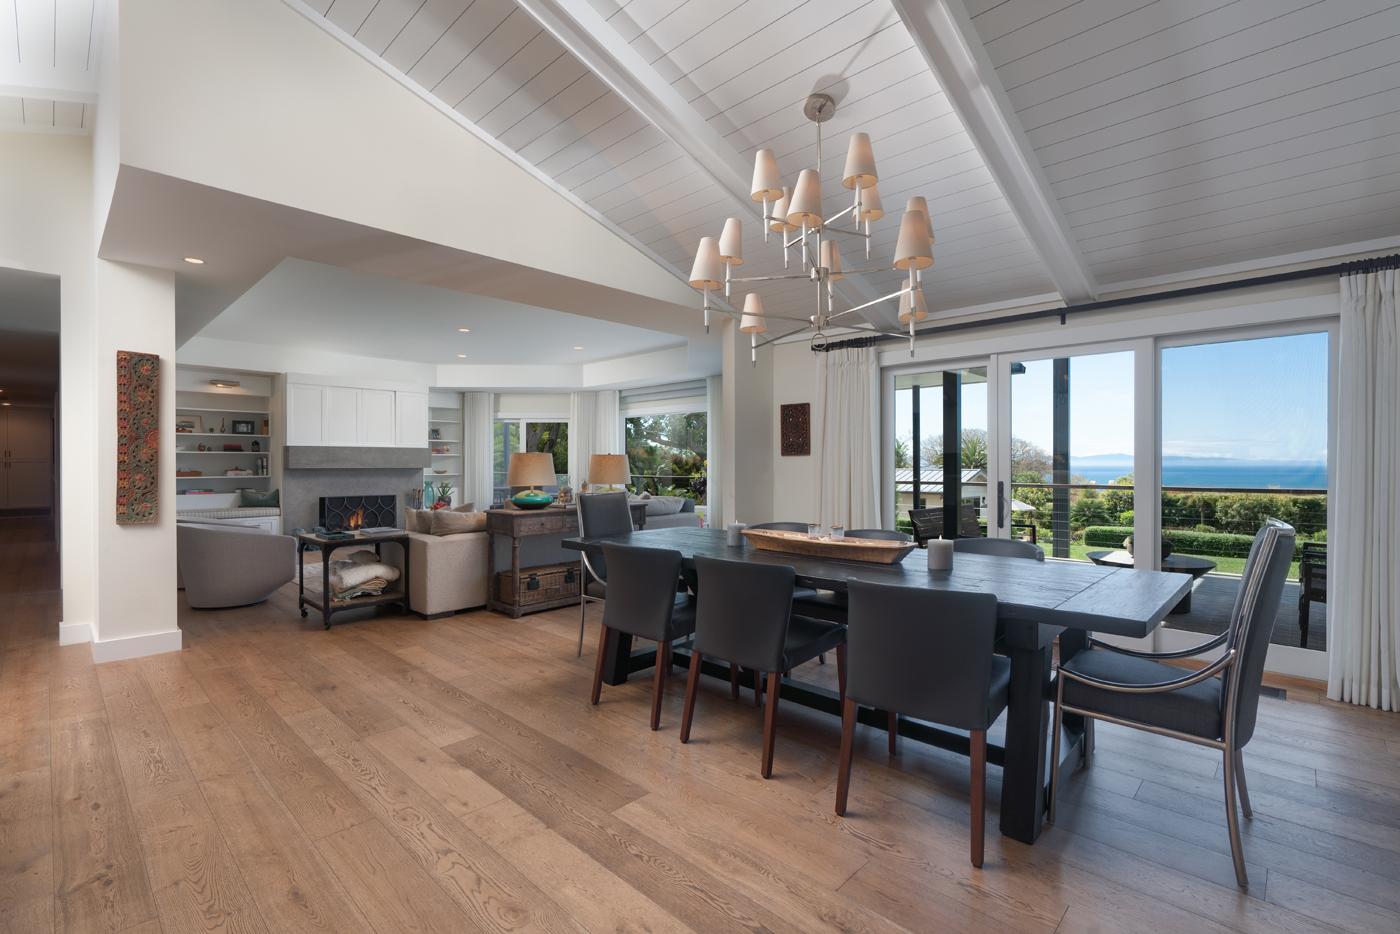 4163_Marina_Drive Hope Ranch Santa Barbara Pocket Listing Riskin Partners Ocean View property home estate private beach guest house